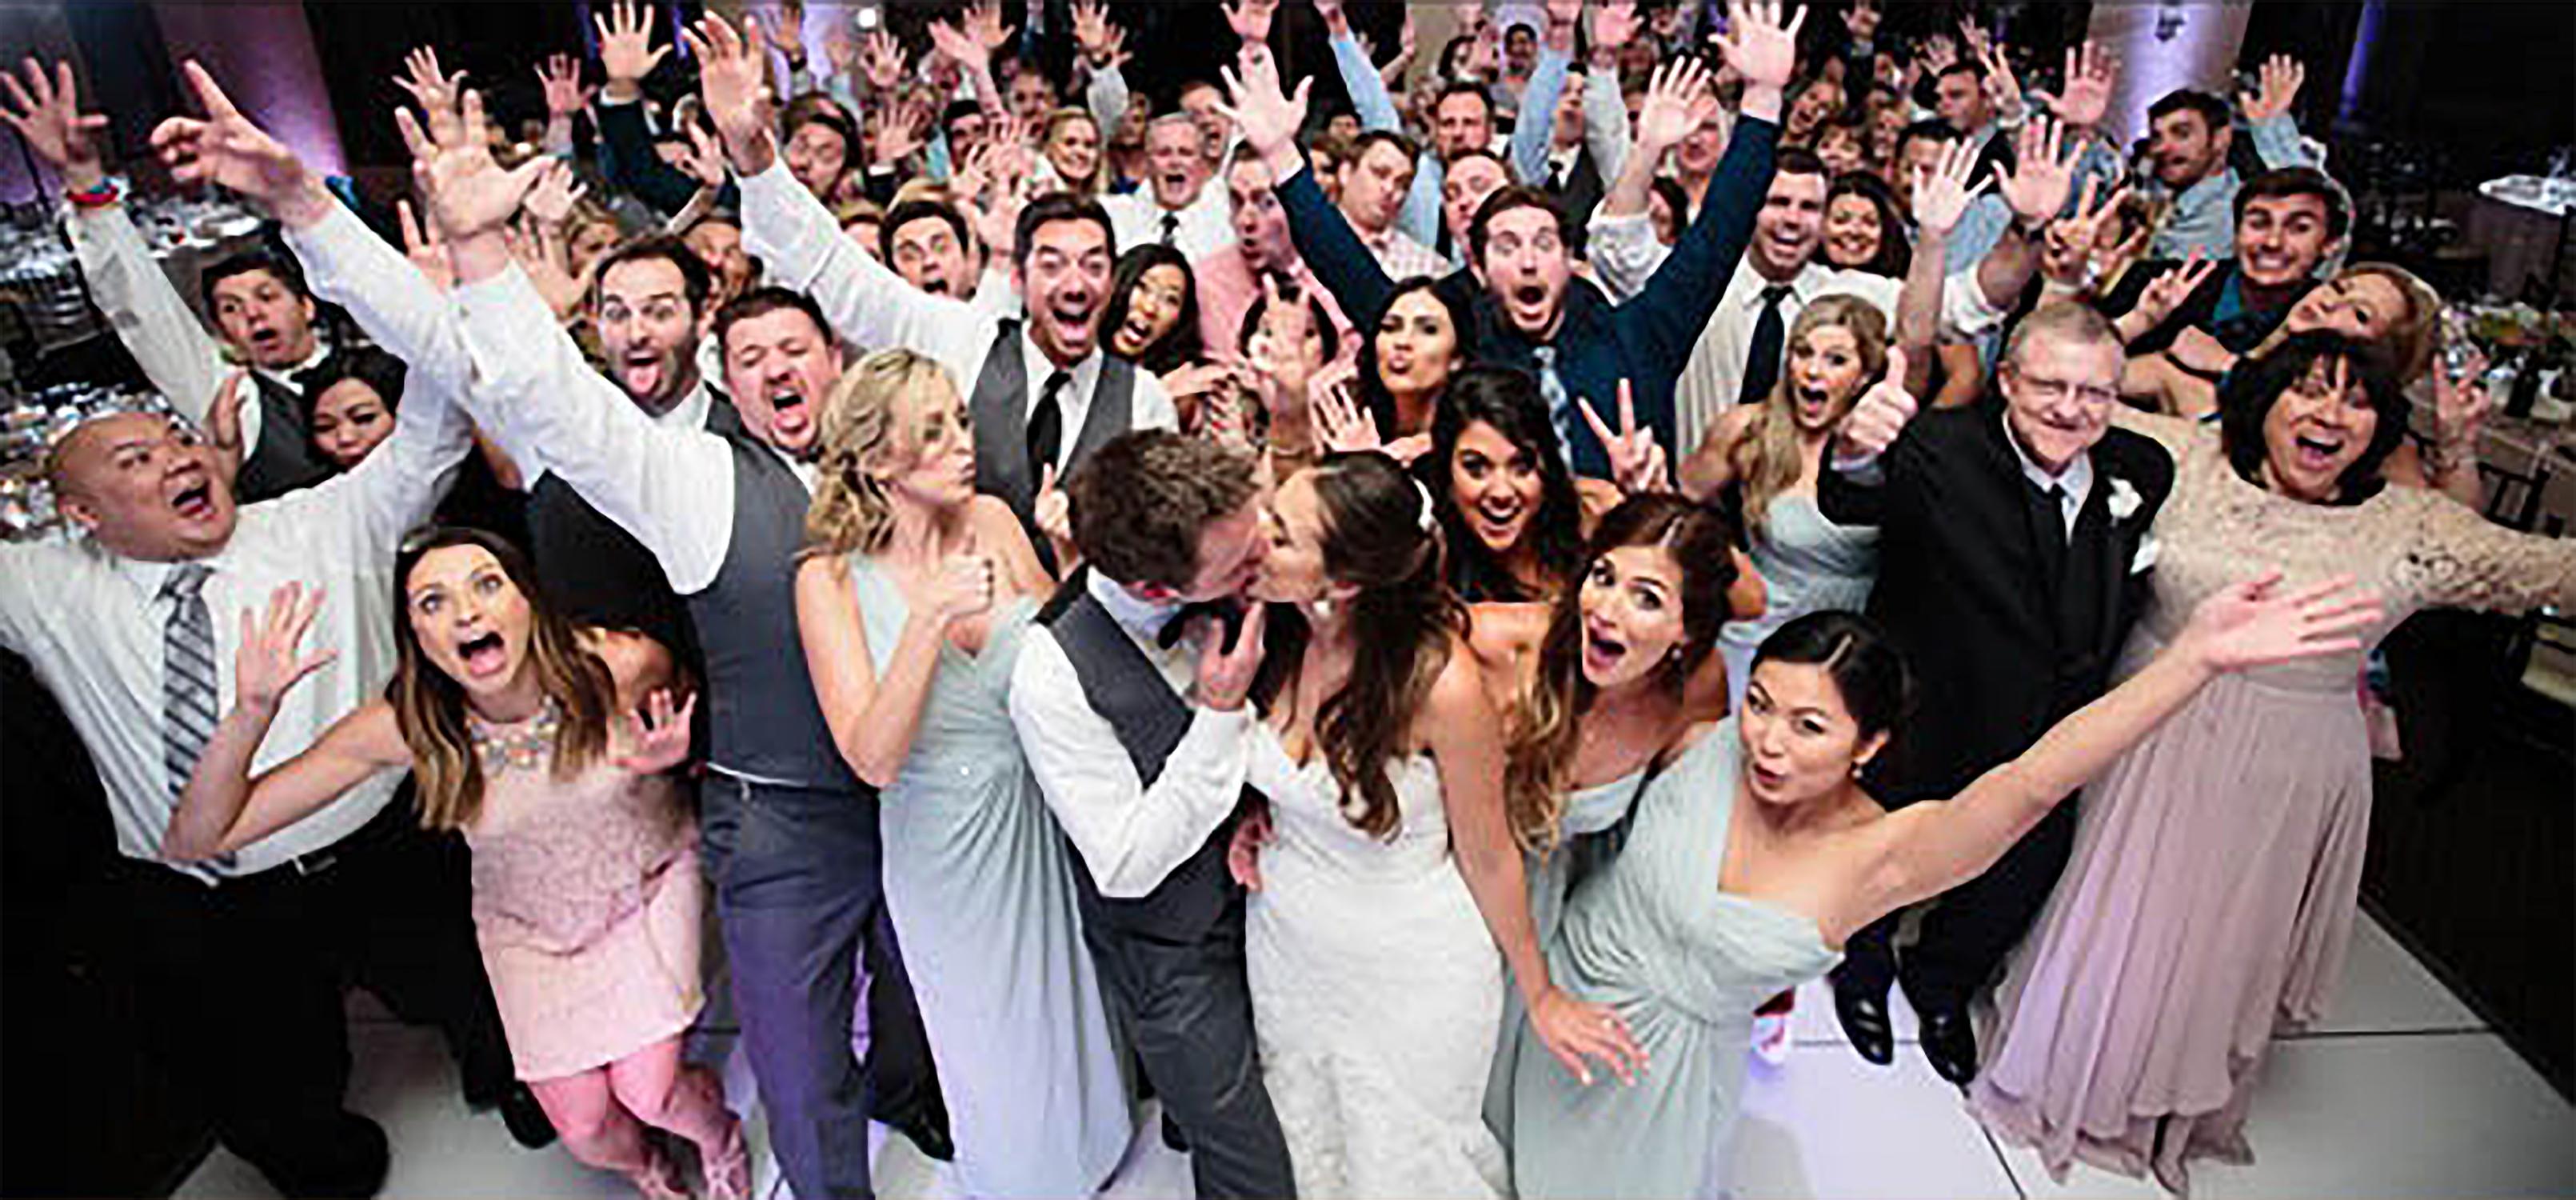 Wedding DJ serving Philadelphia, Delaware and New Jersey